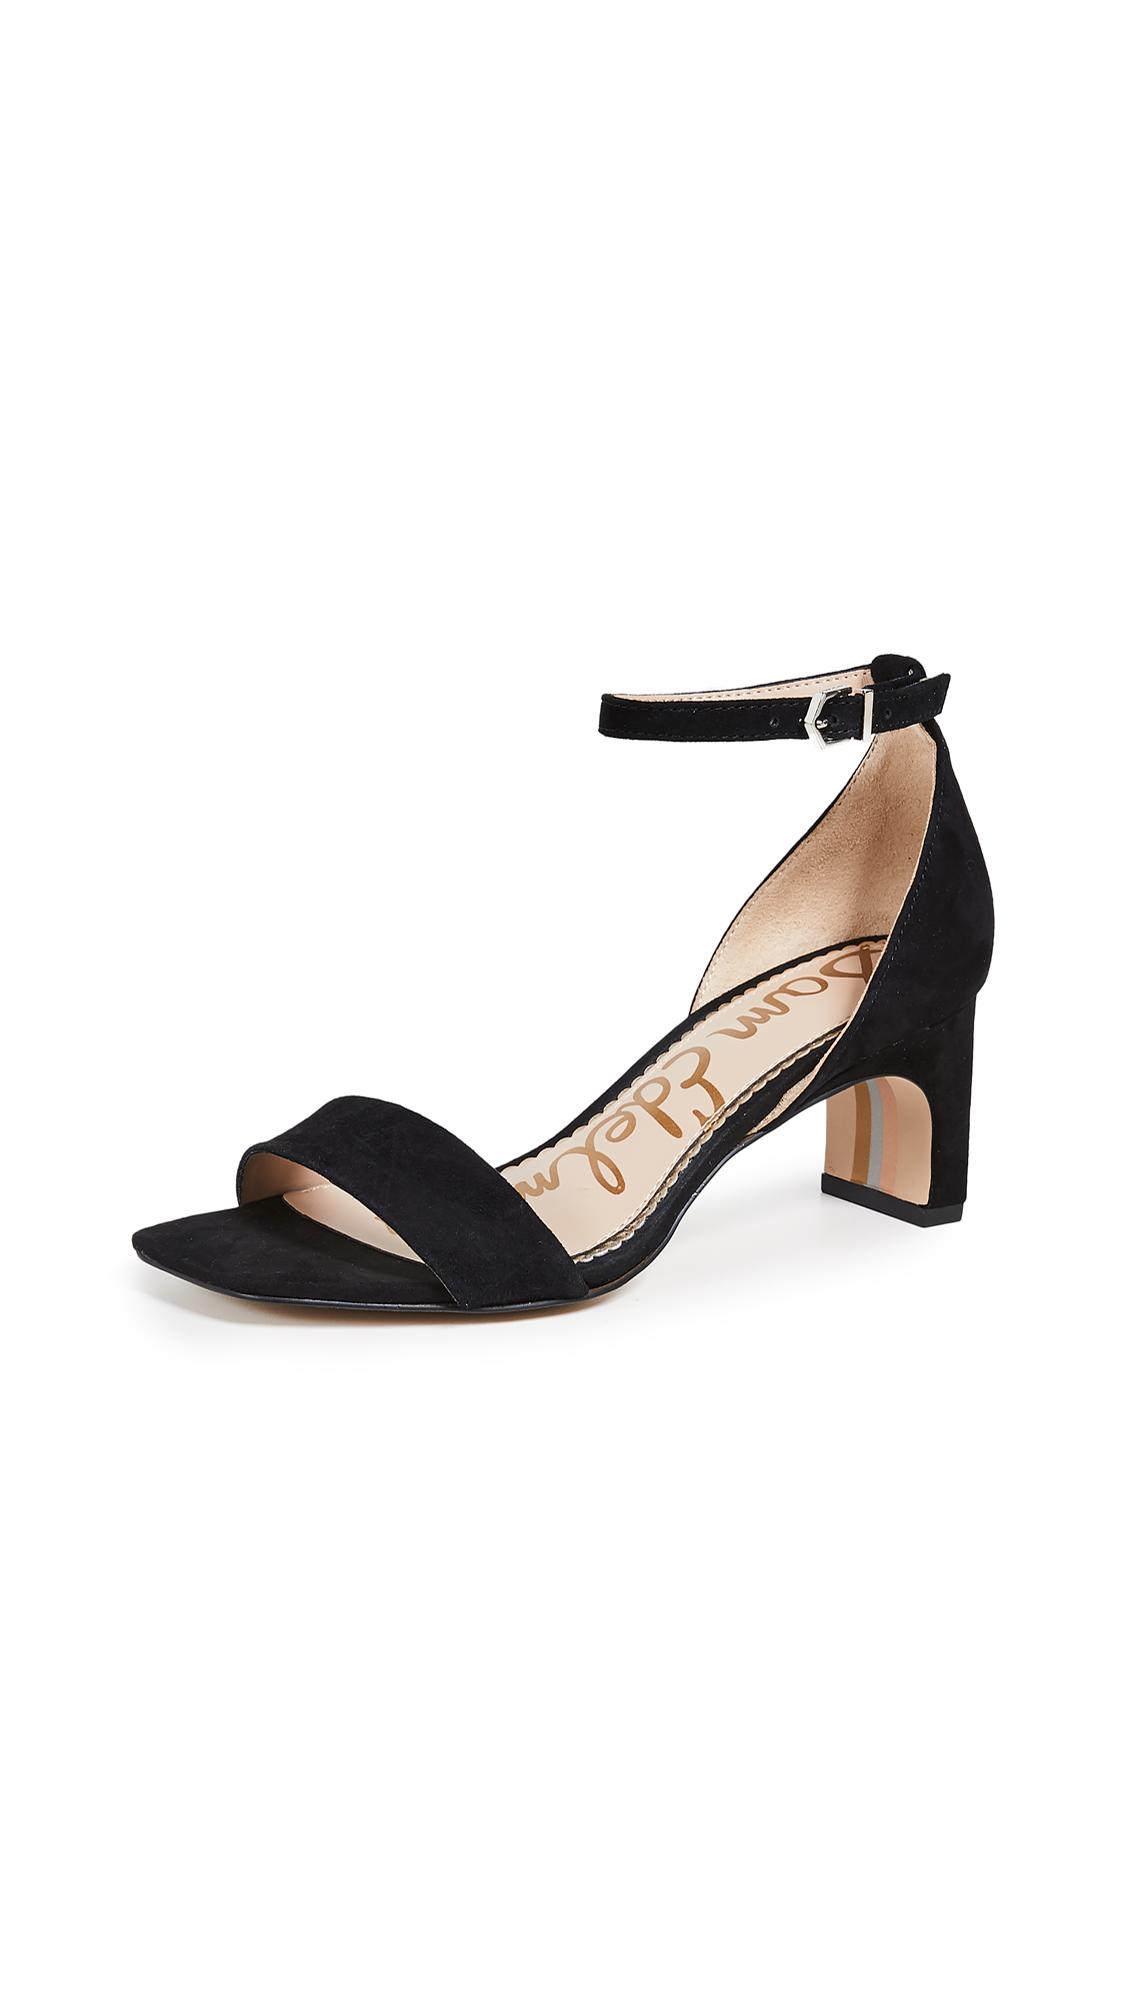 Sam Edelman Holmes Sandals - Black